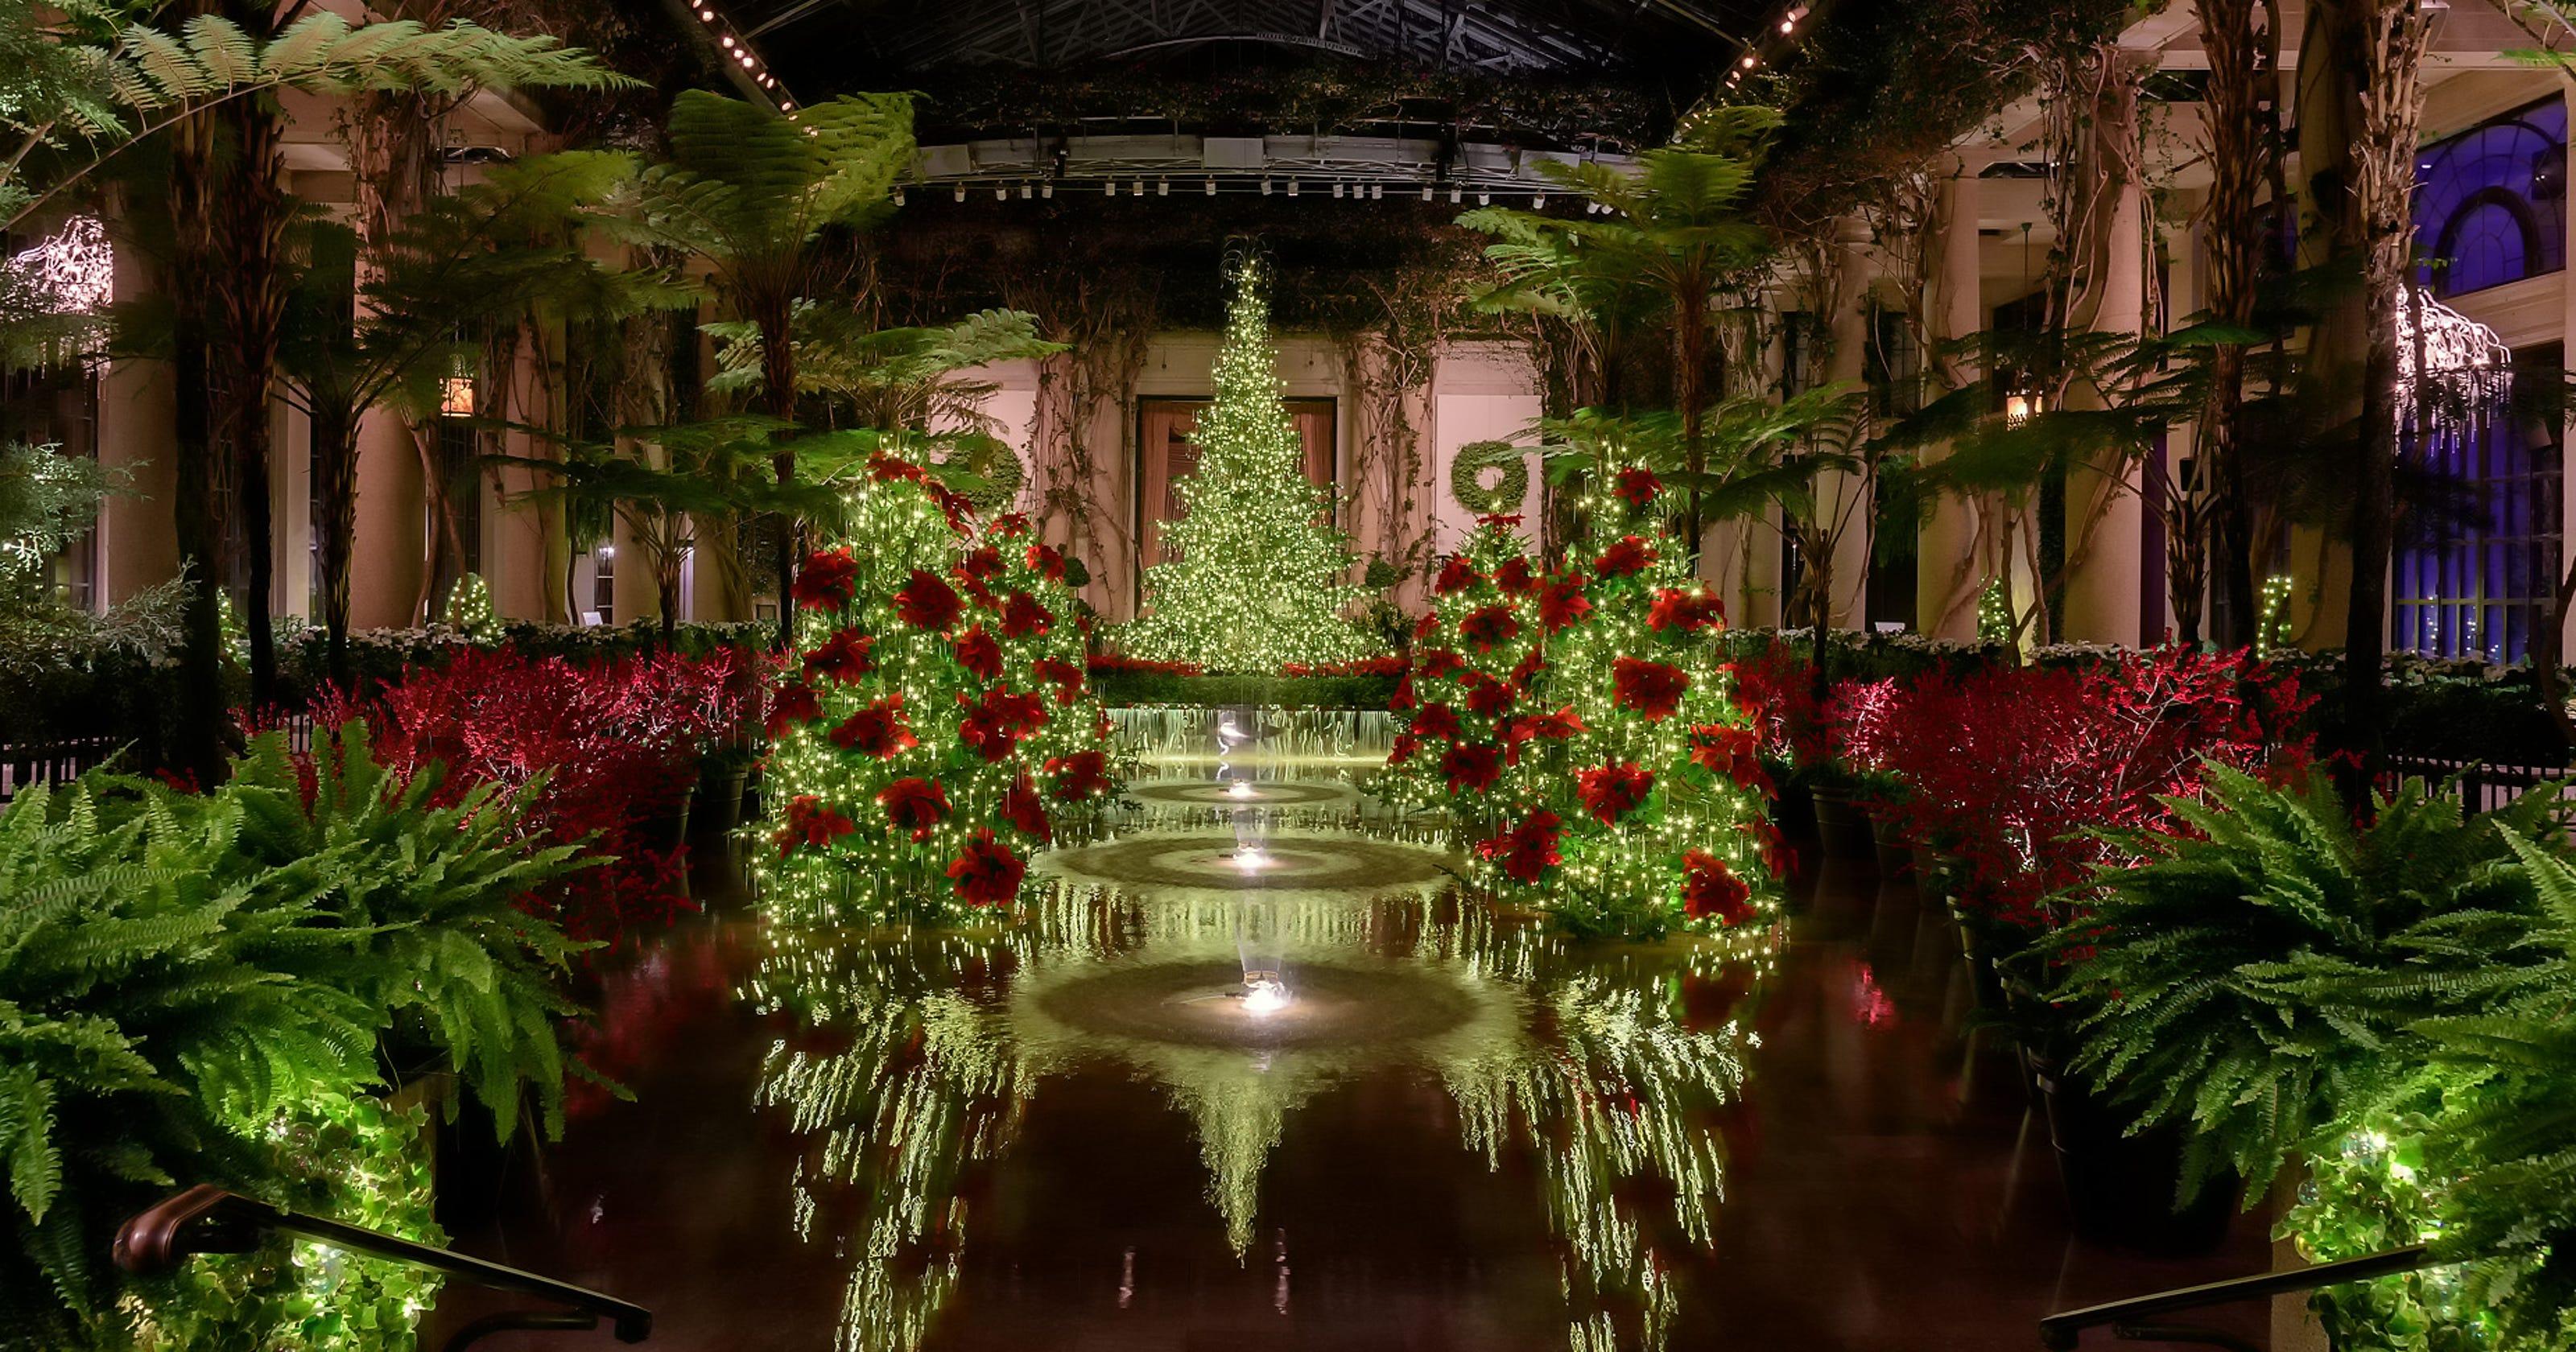 Longwood Gardens lights up holidays